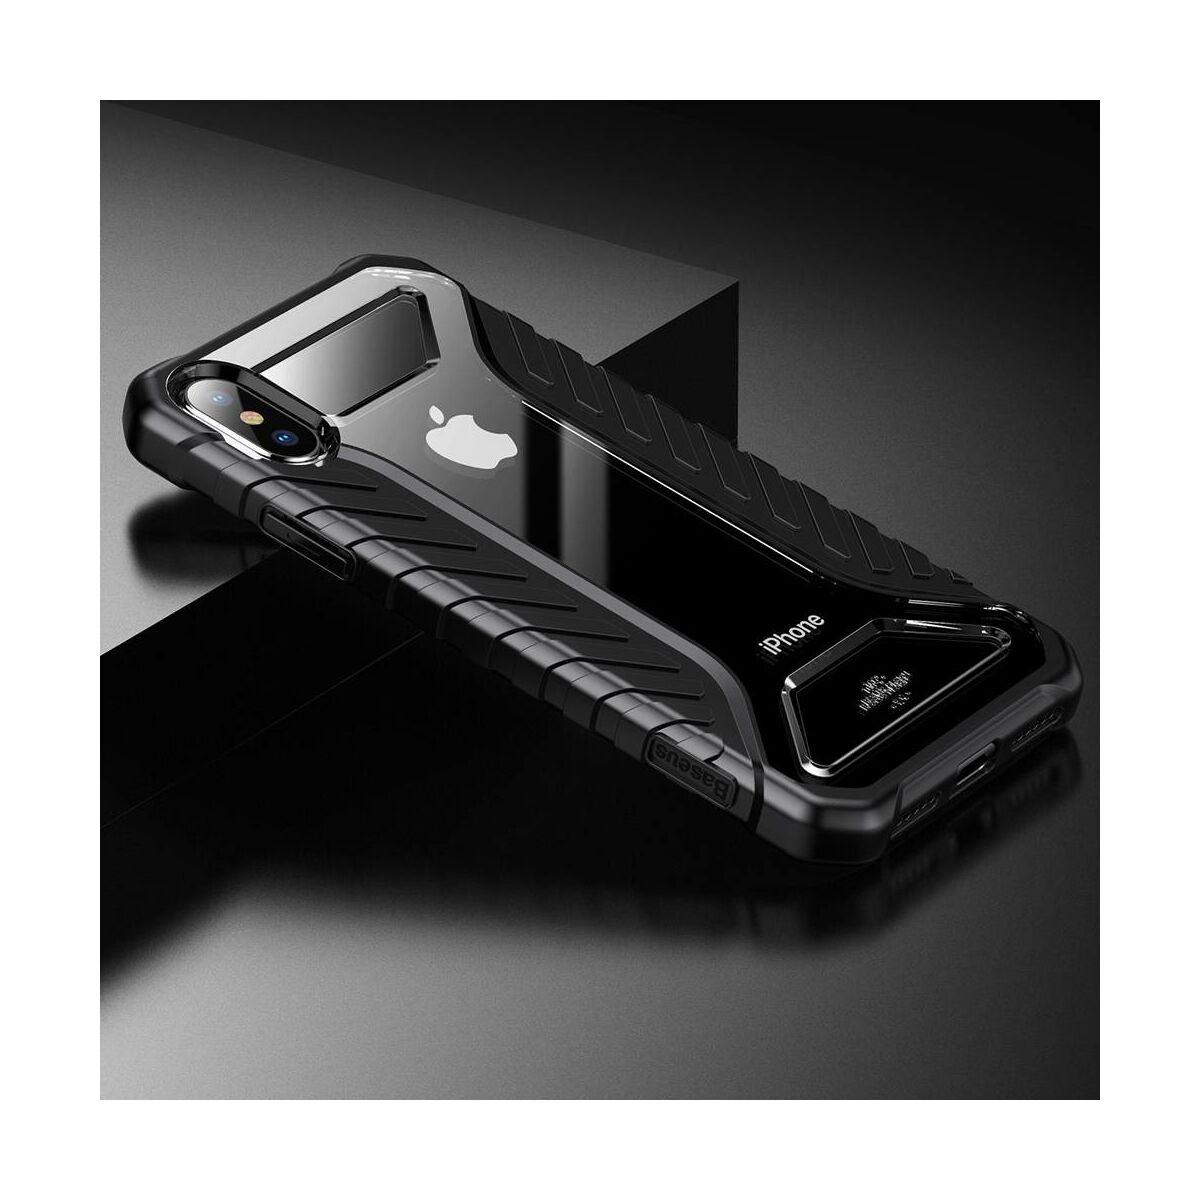 Baseus iPhone XS tok, Michelin, fekete (WIAPIPH58-MK01)